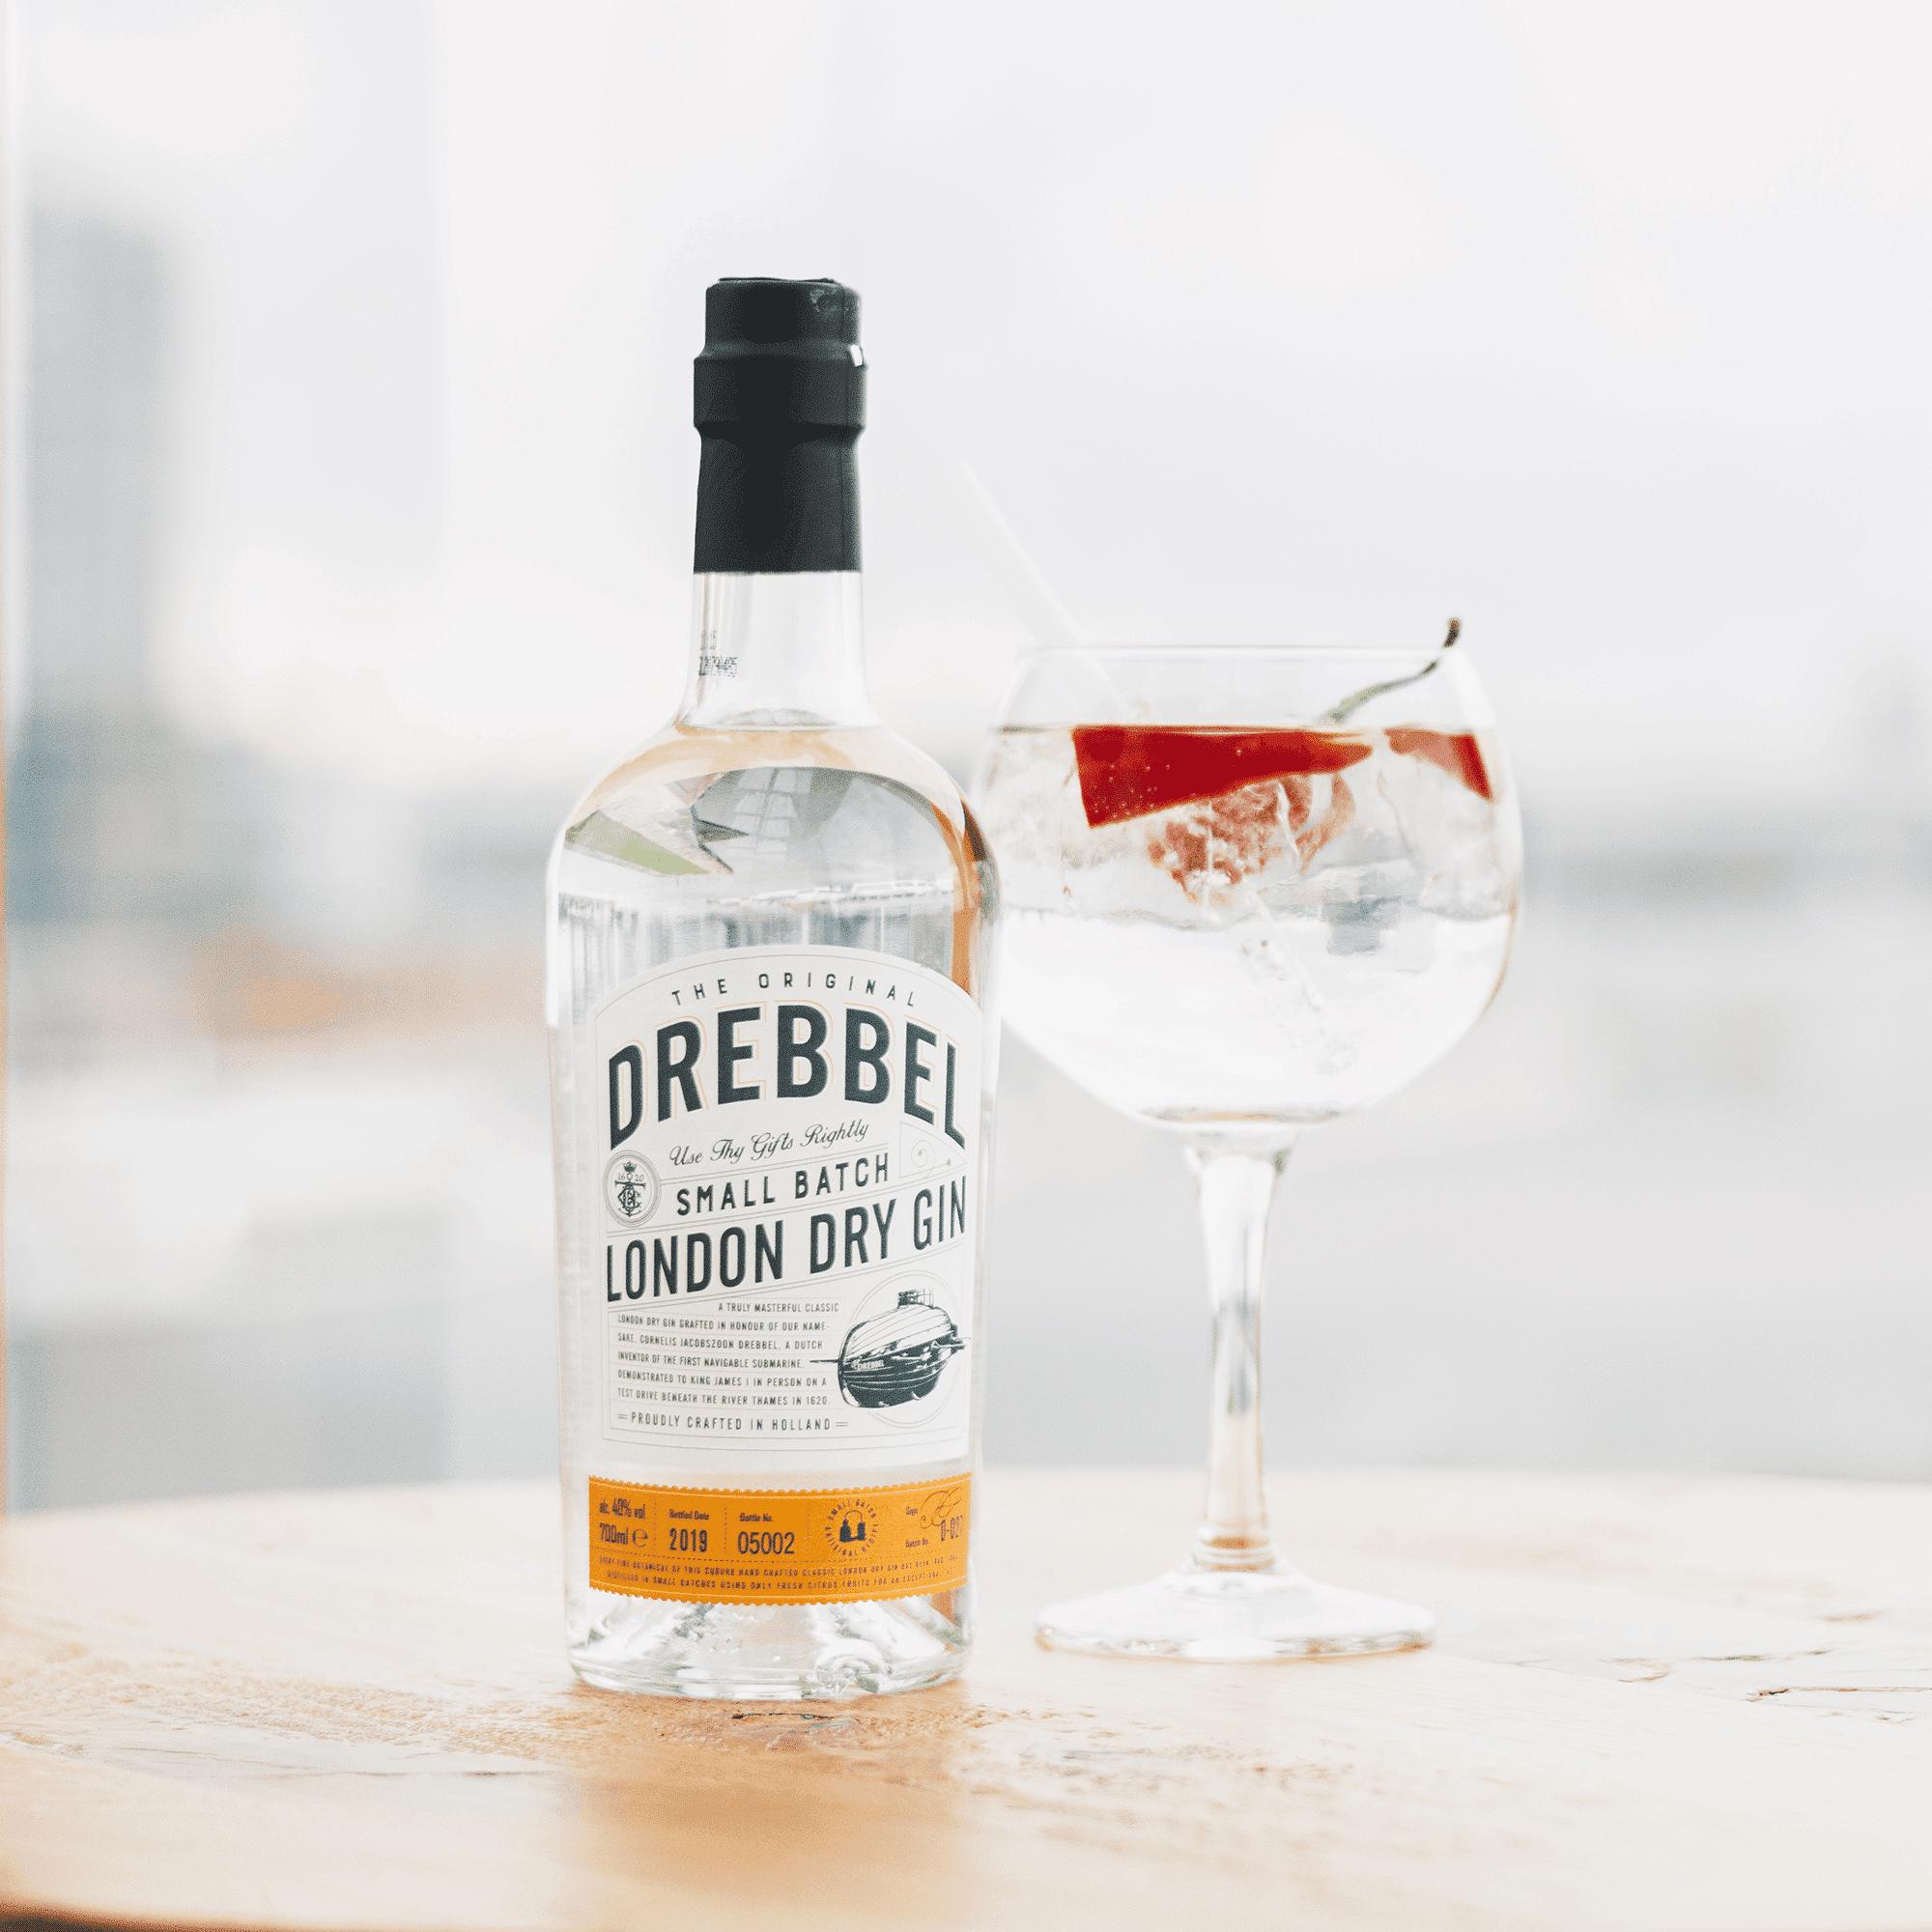 Drebbel Small Batch London Gin